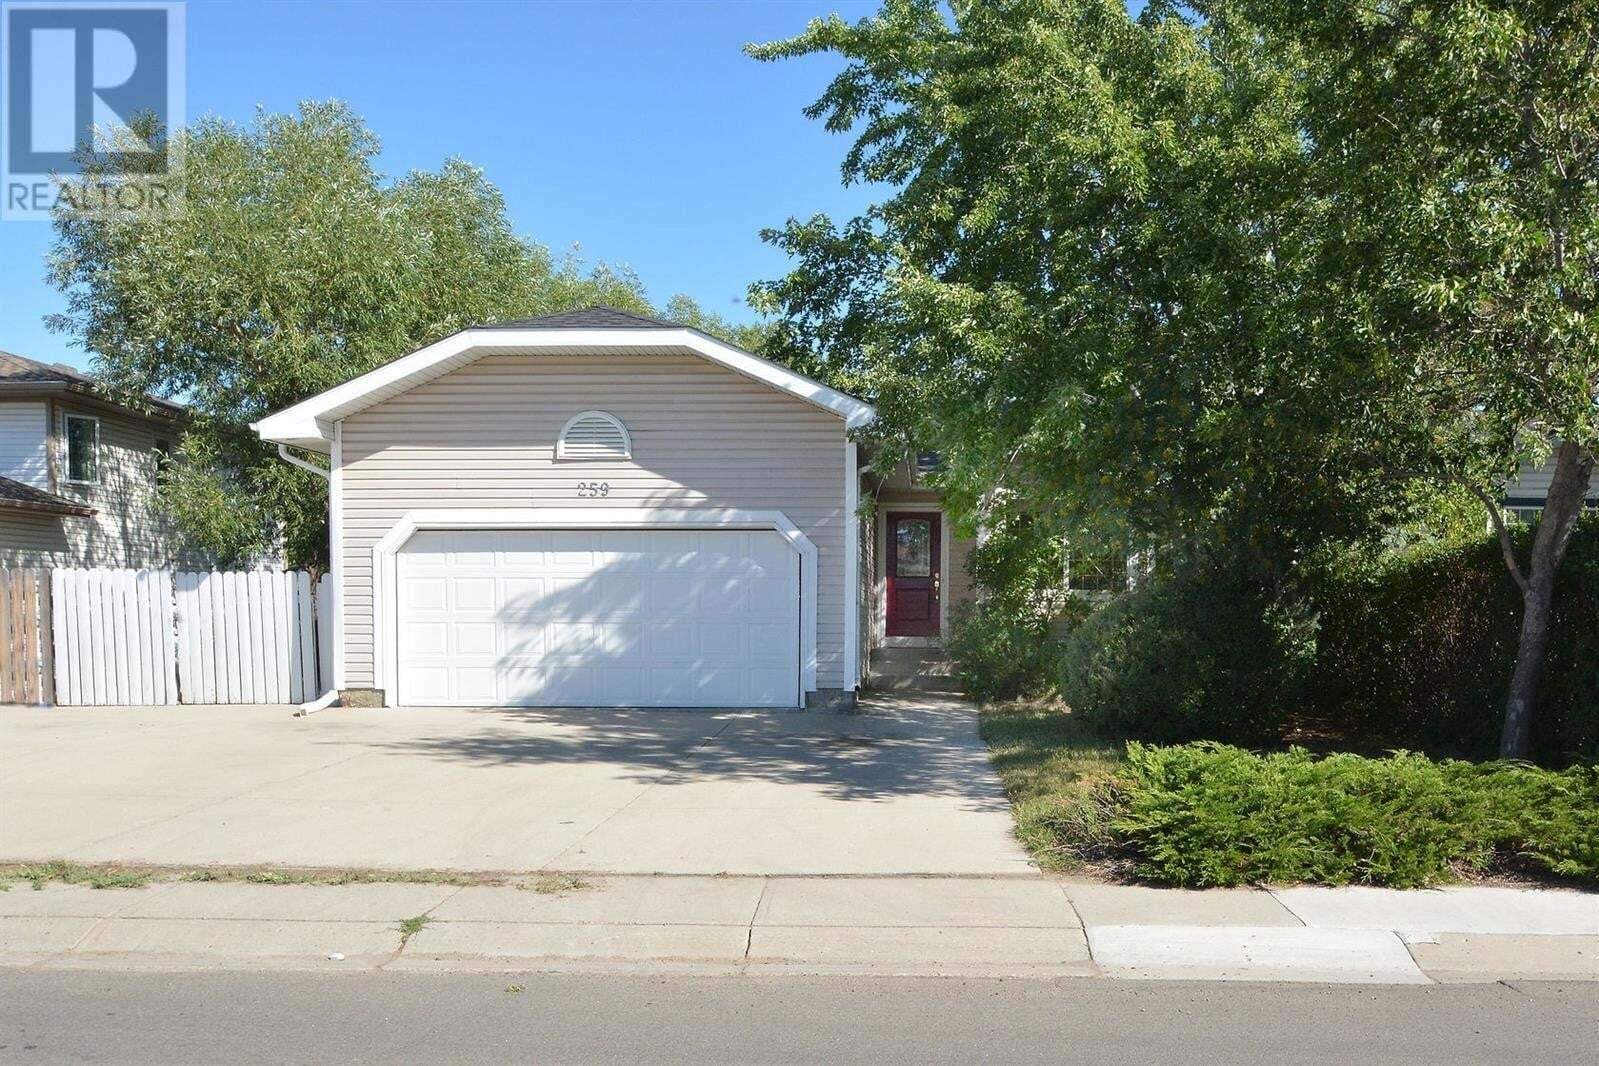 House for sale at 259 Konihowski Rd Saskatoon Saskatchewan - MLS: SK820965